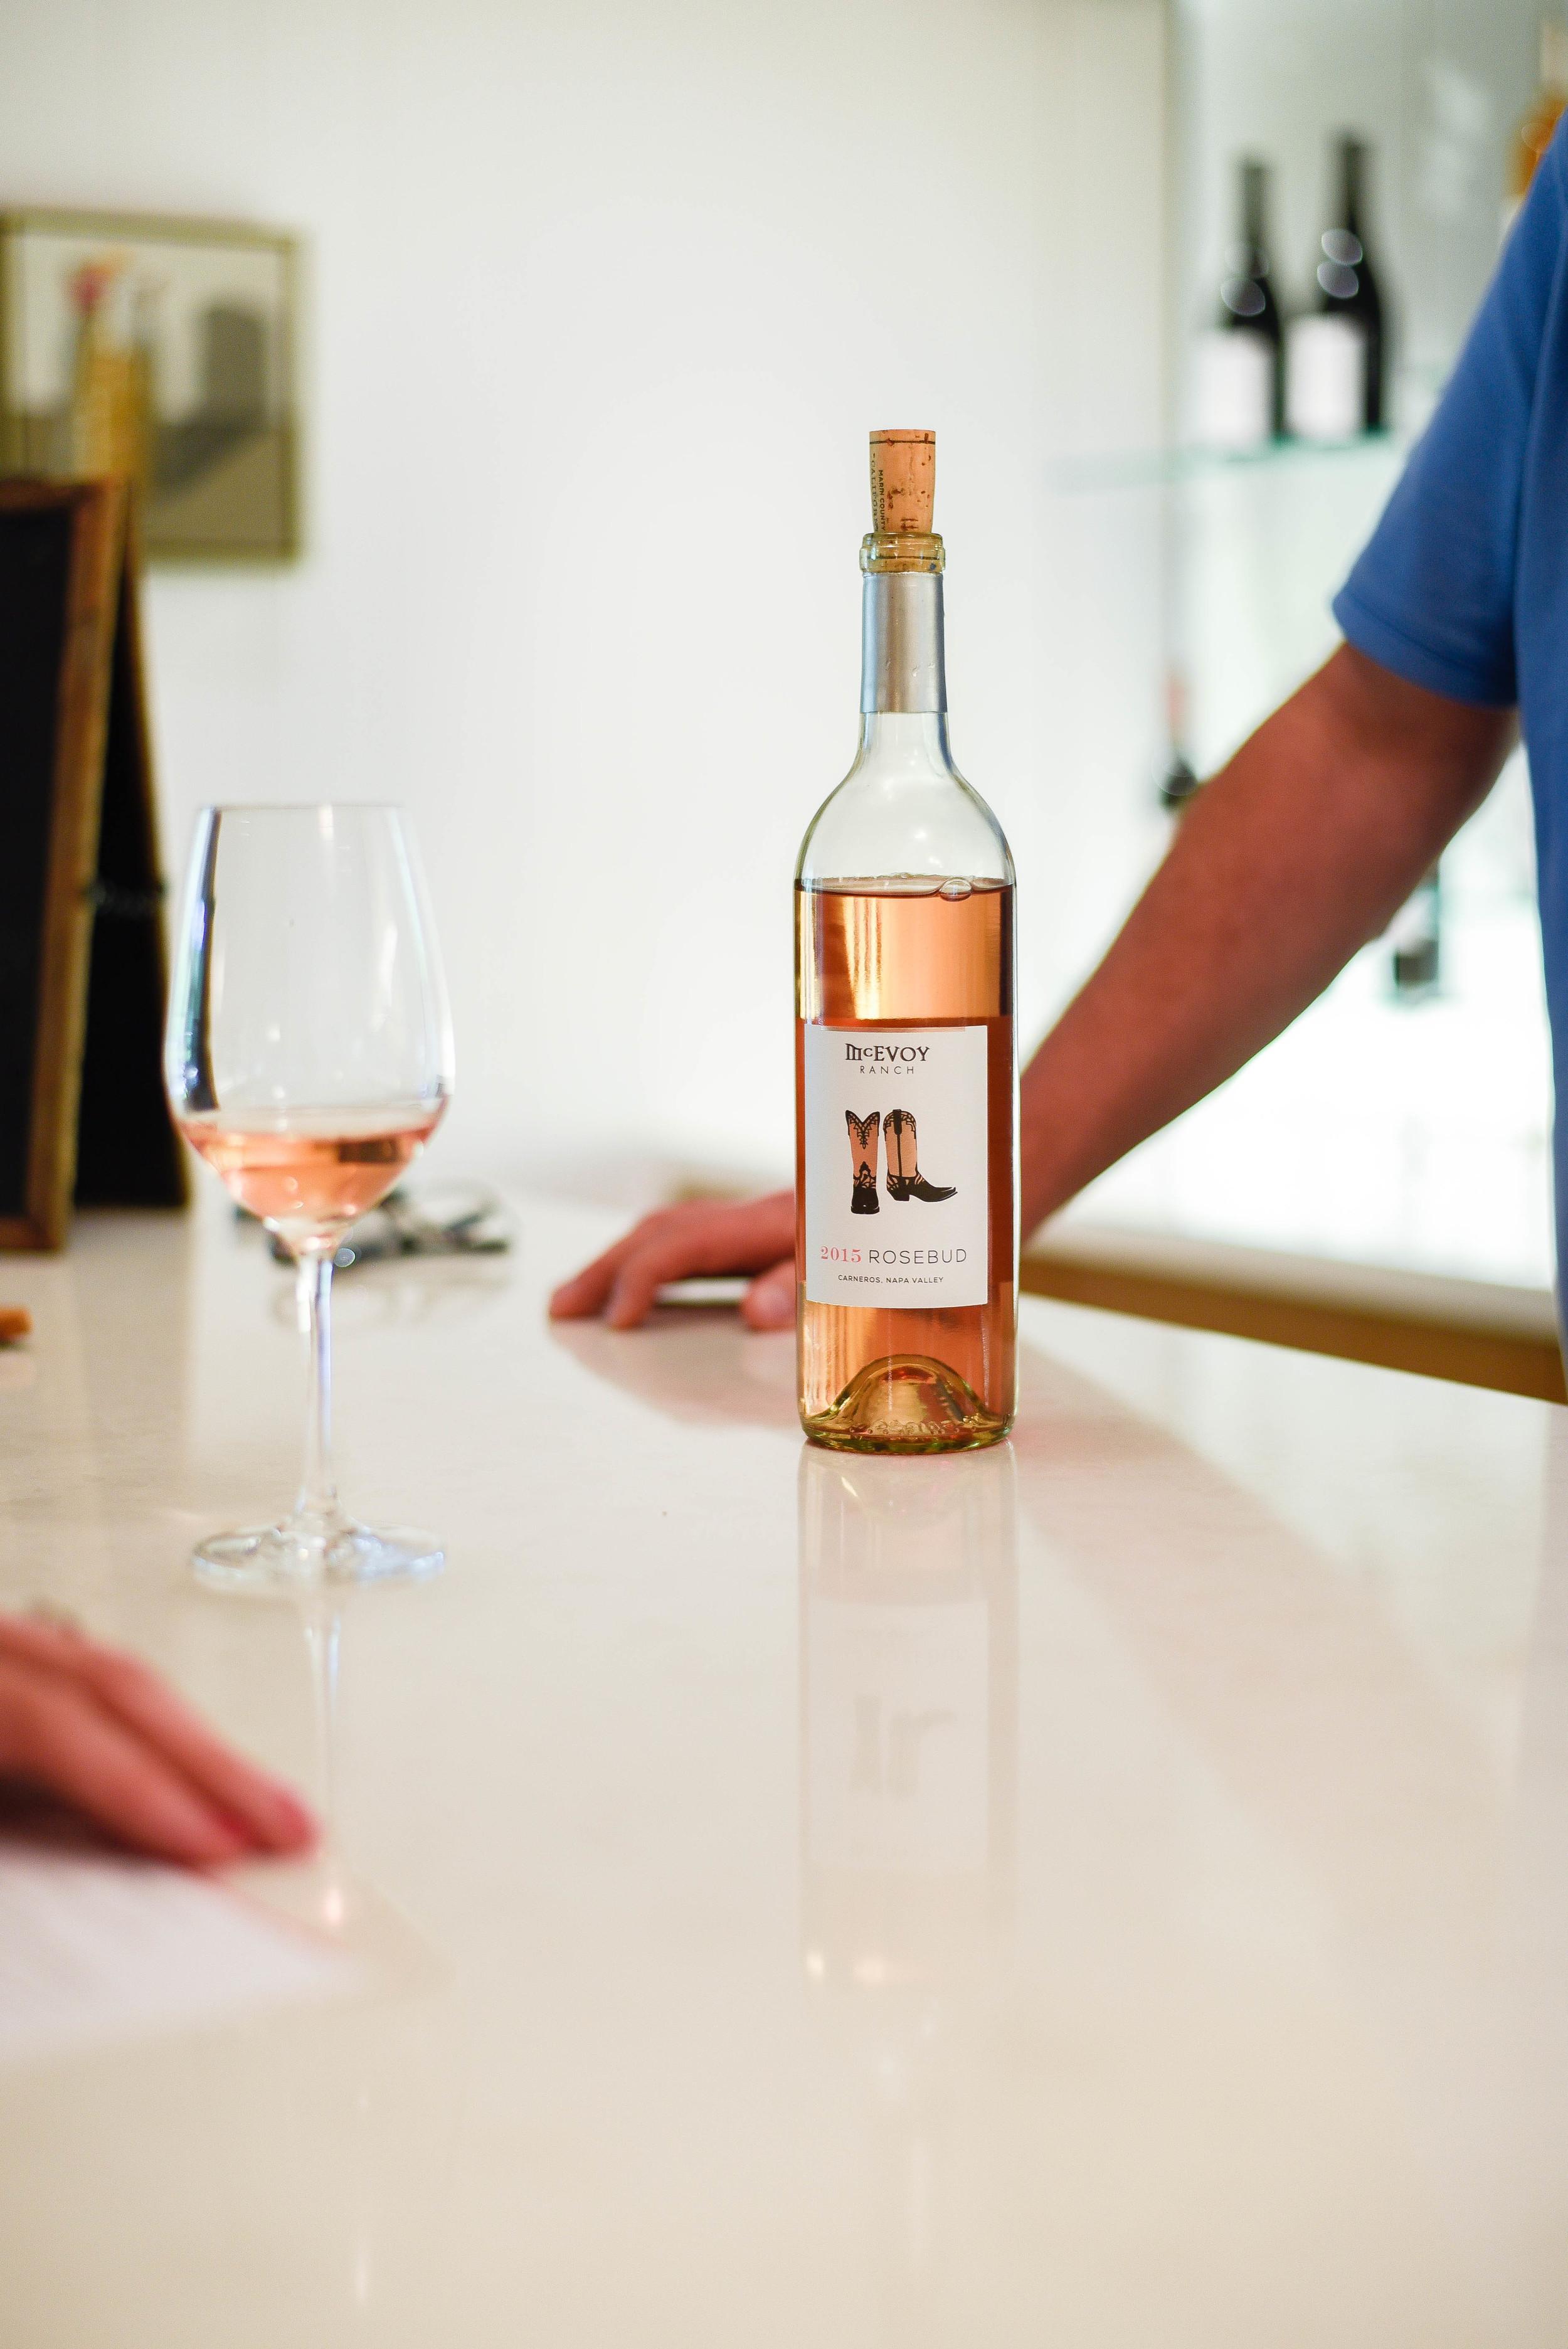 McEvoy Ranch Extra Virgin Olive Oil & Wine | Petaluma, Ca | asavvylifestyle.com